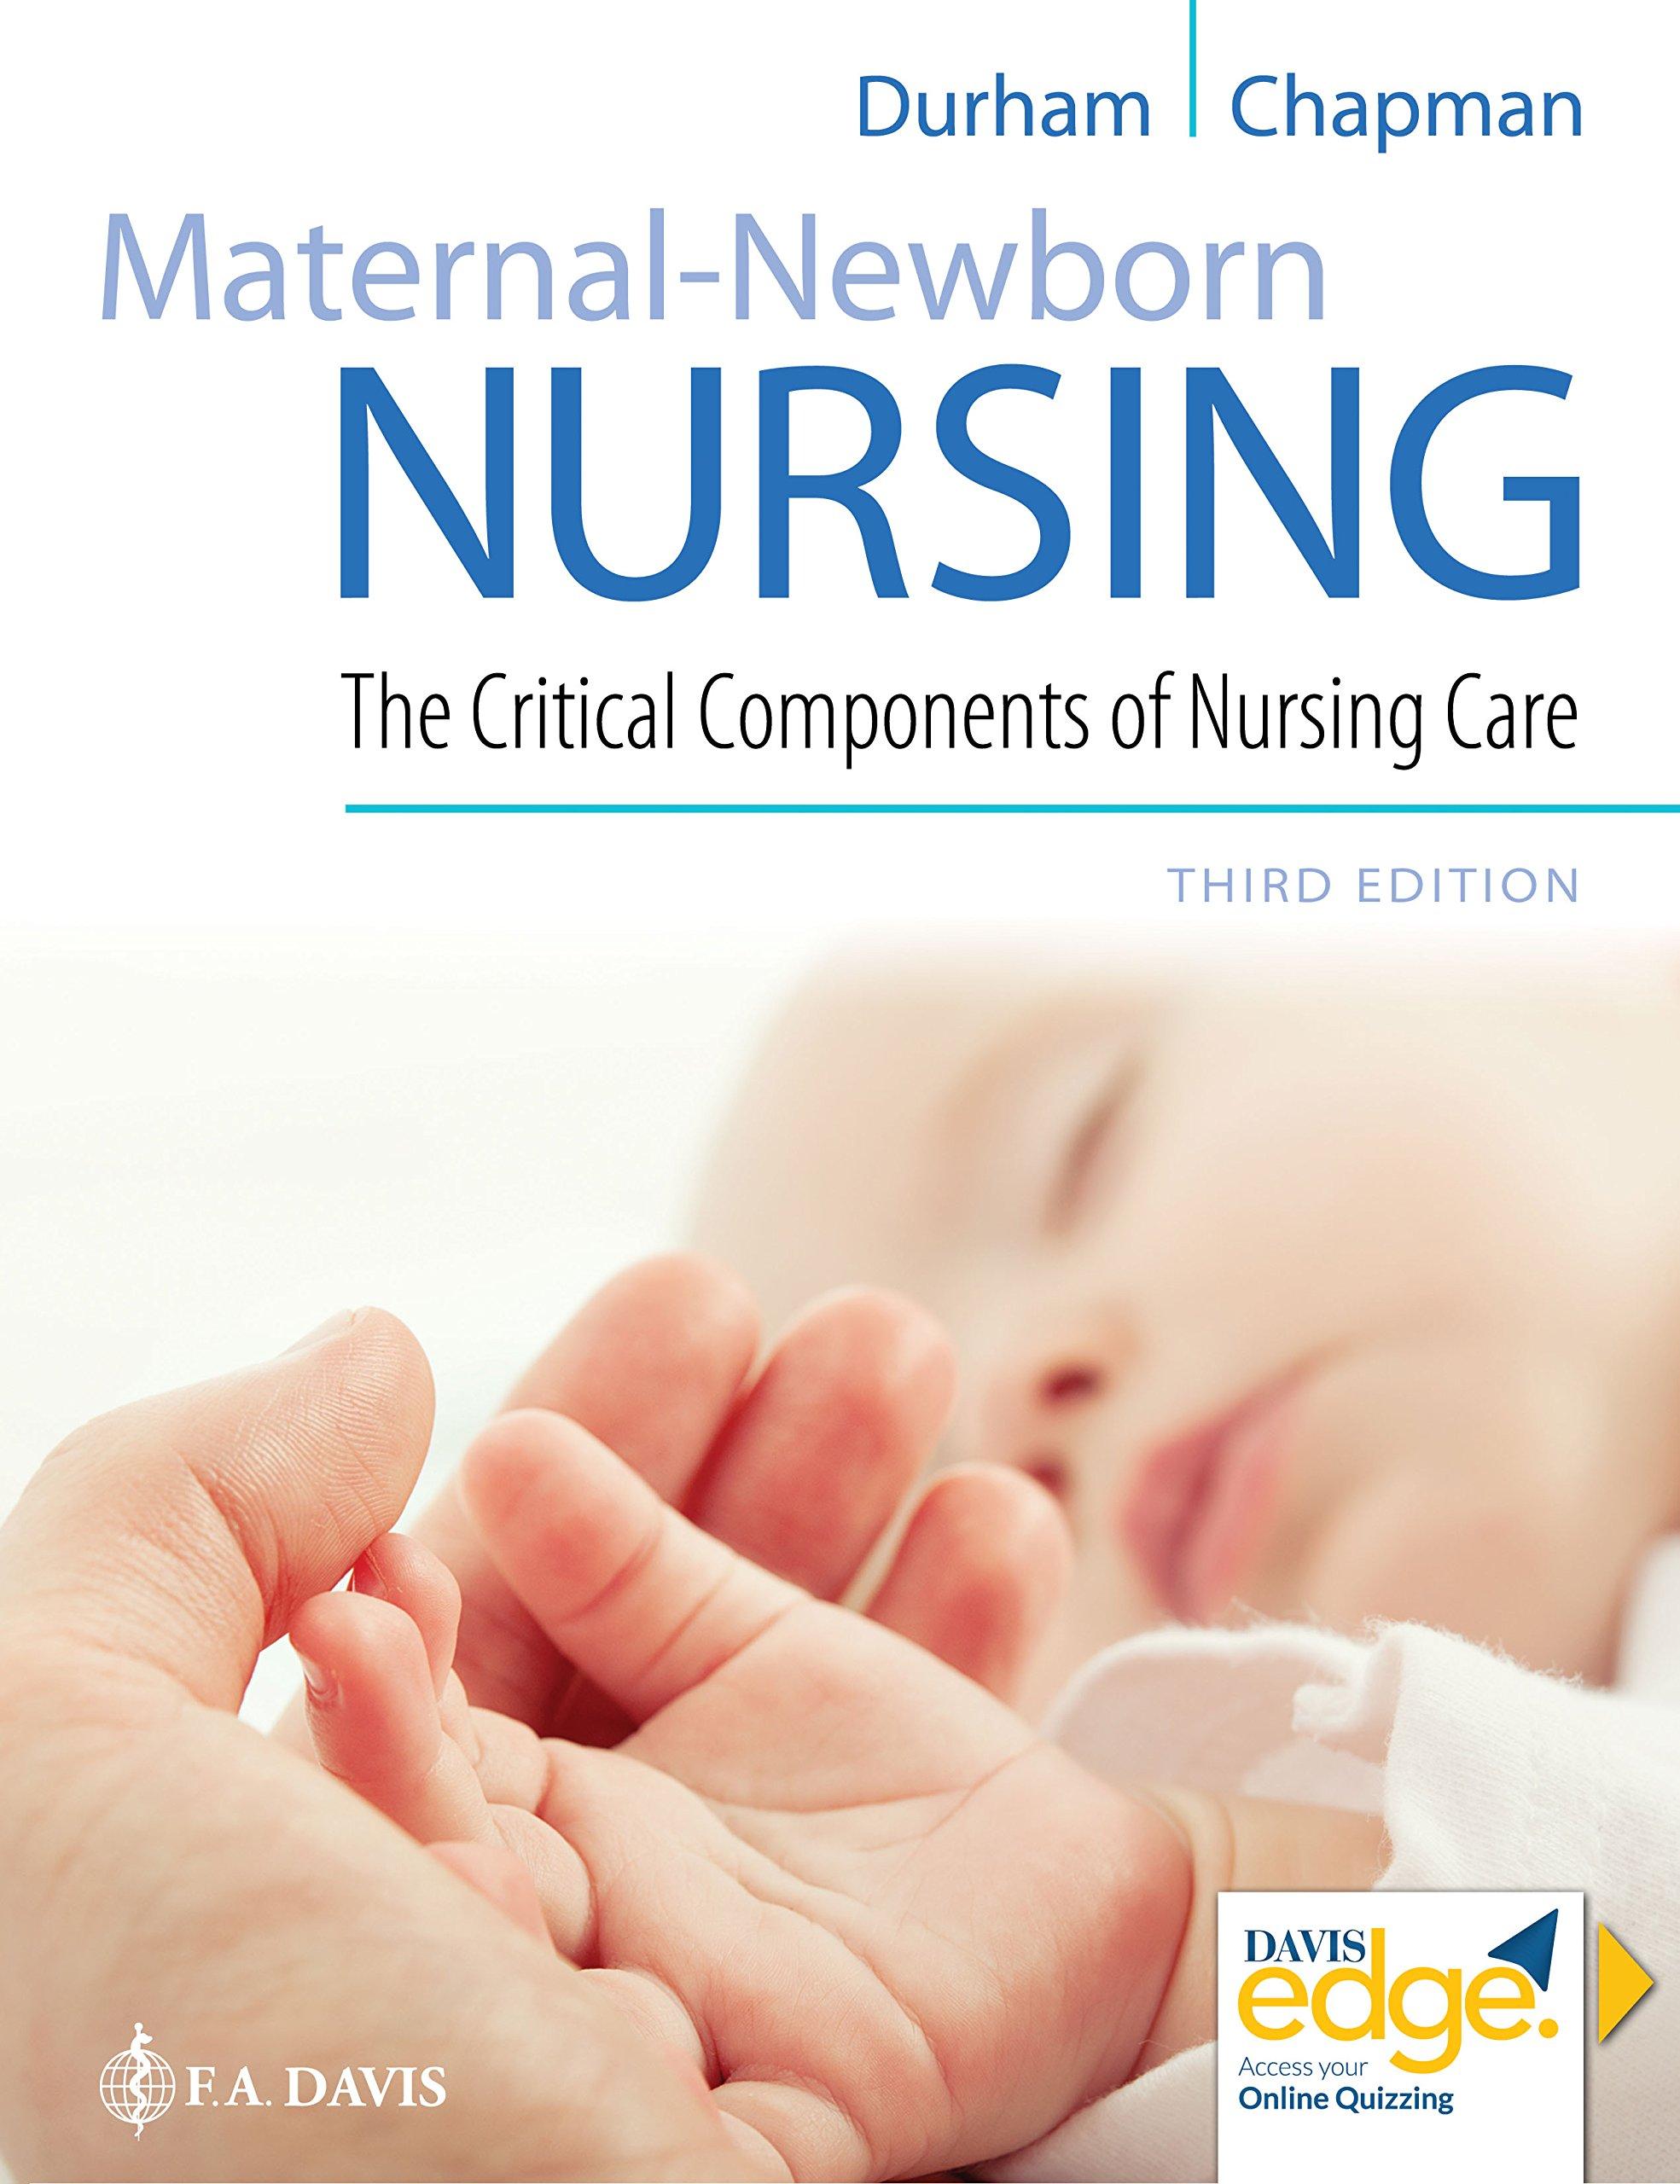 Maternal-Newborn Nursing: The Critical Components of Nursing Care by F.A. Davis Company